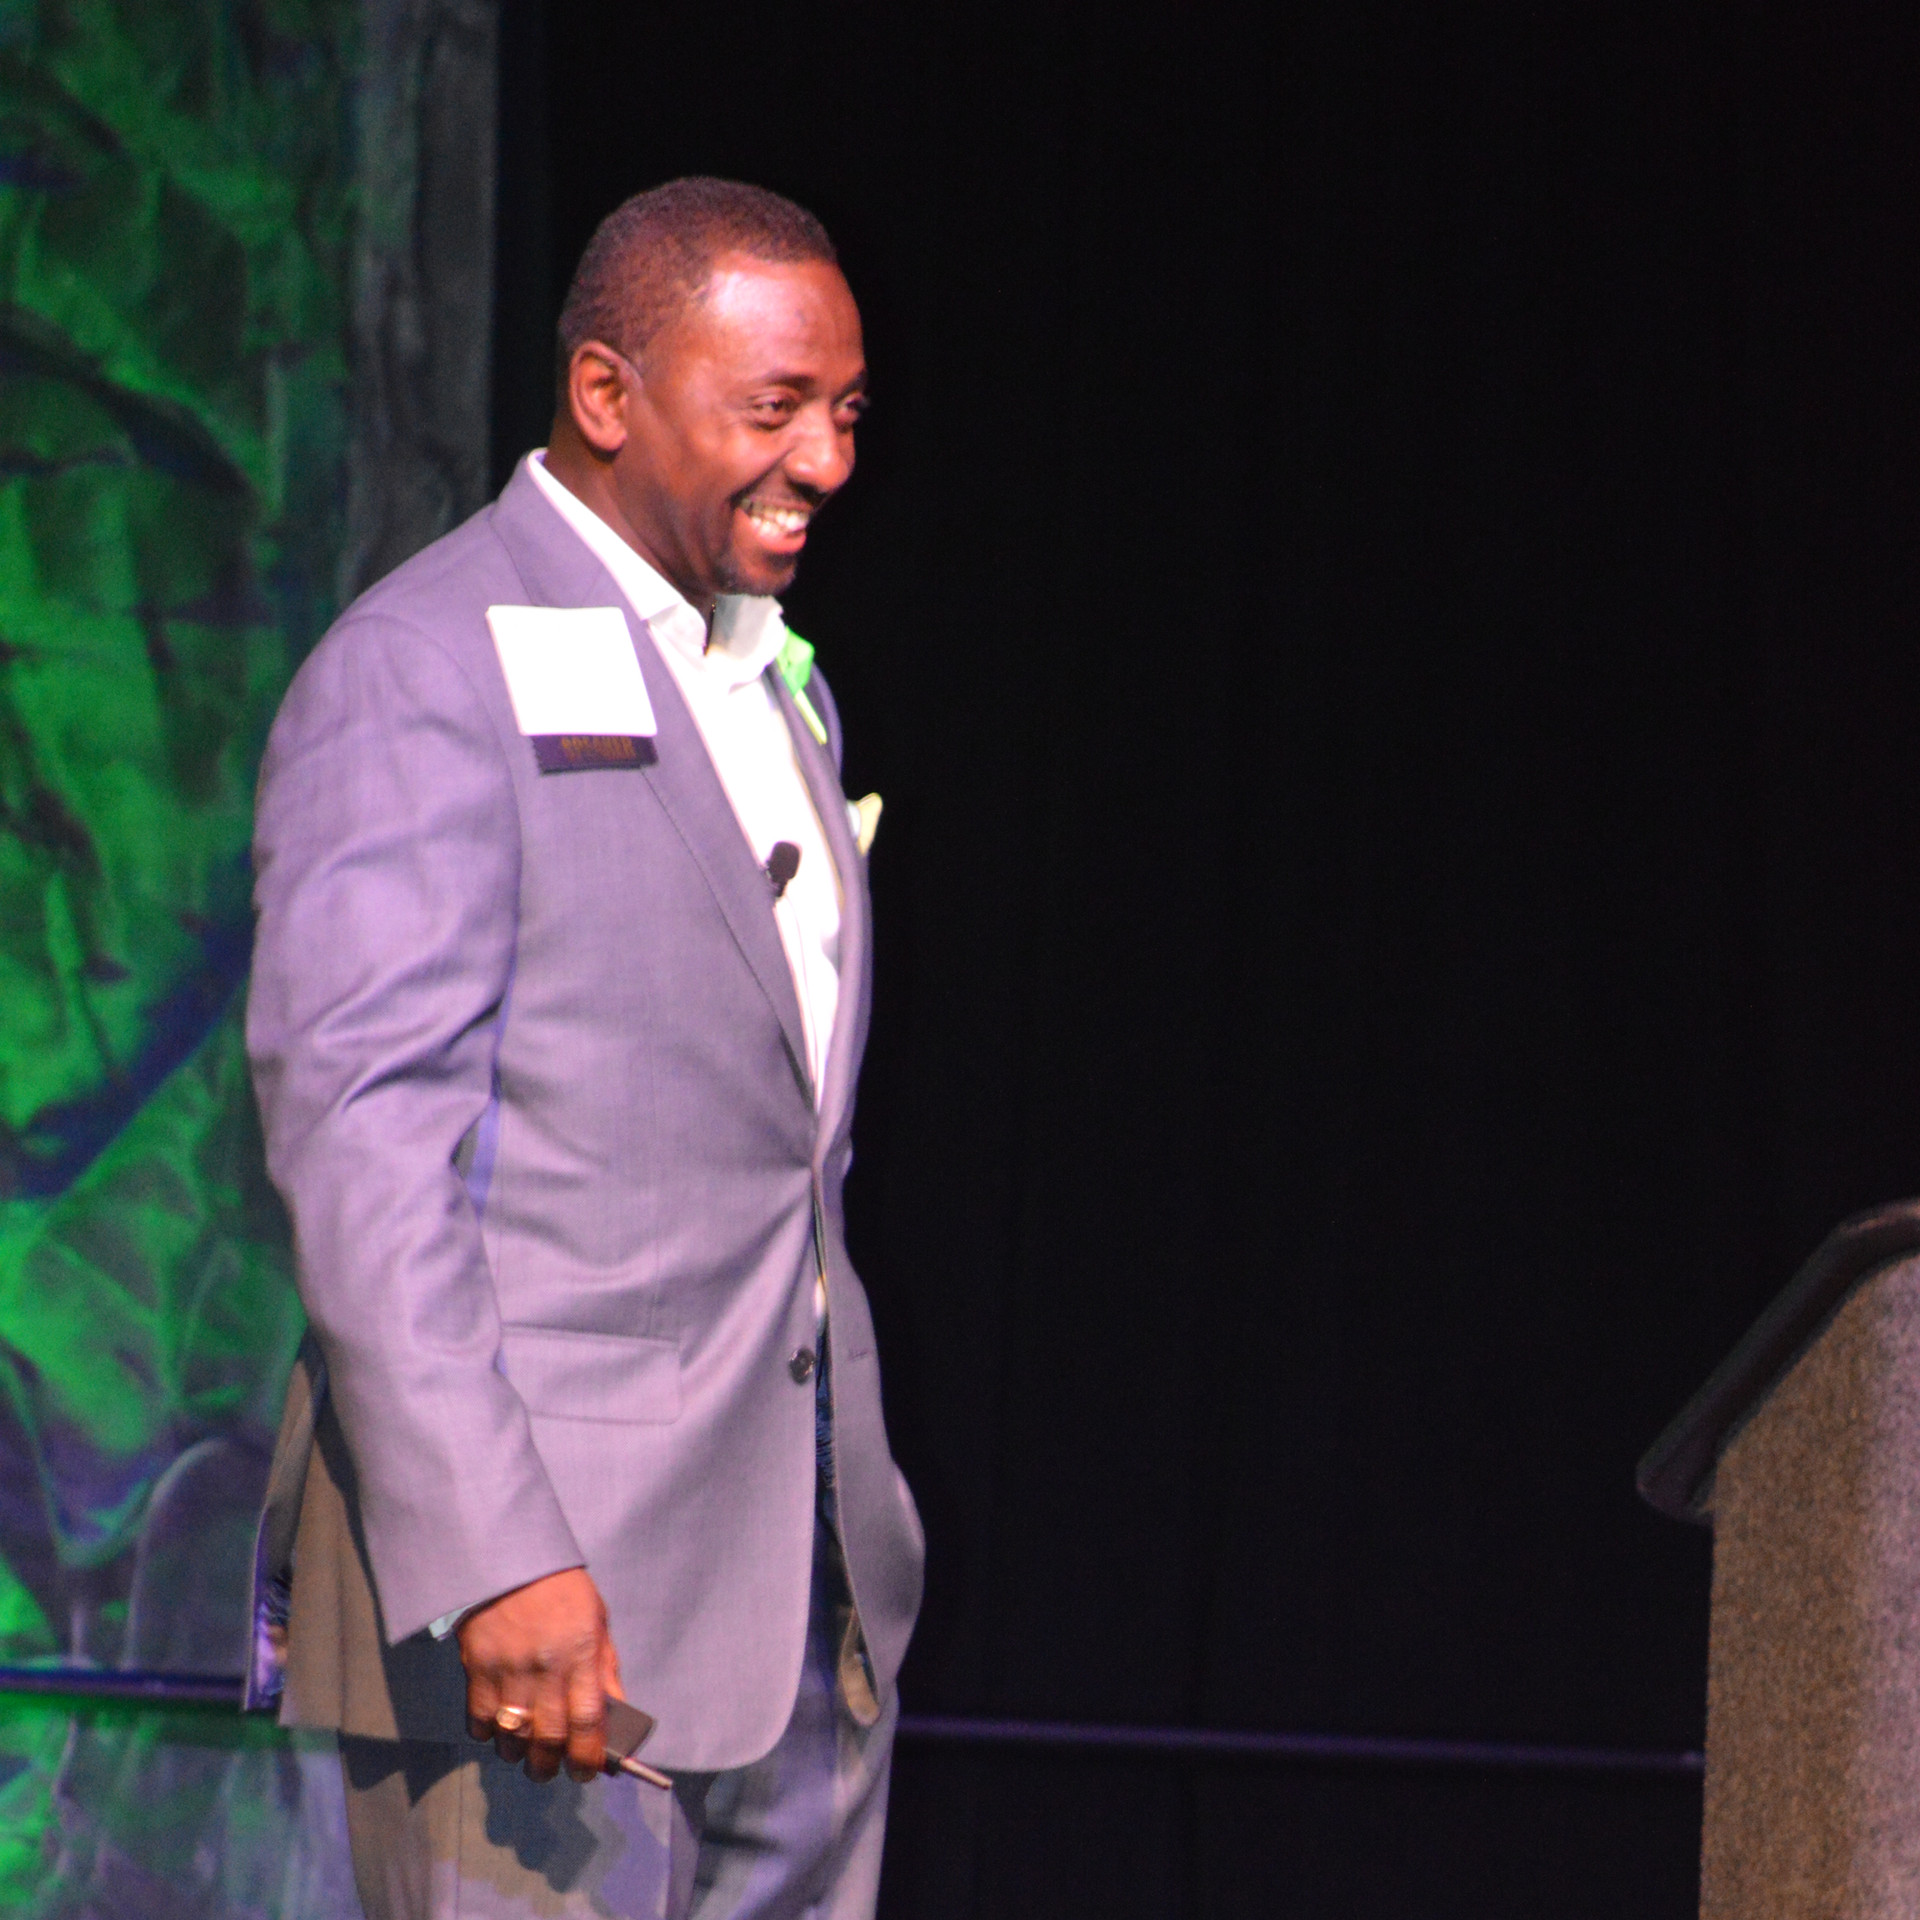 Rev. Lamb, AECC President